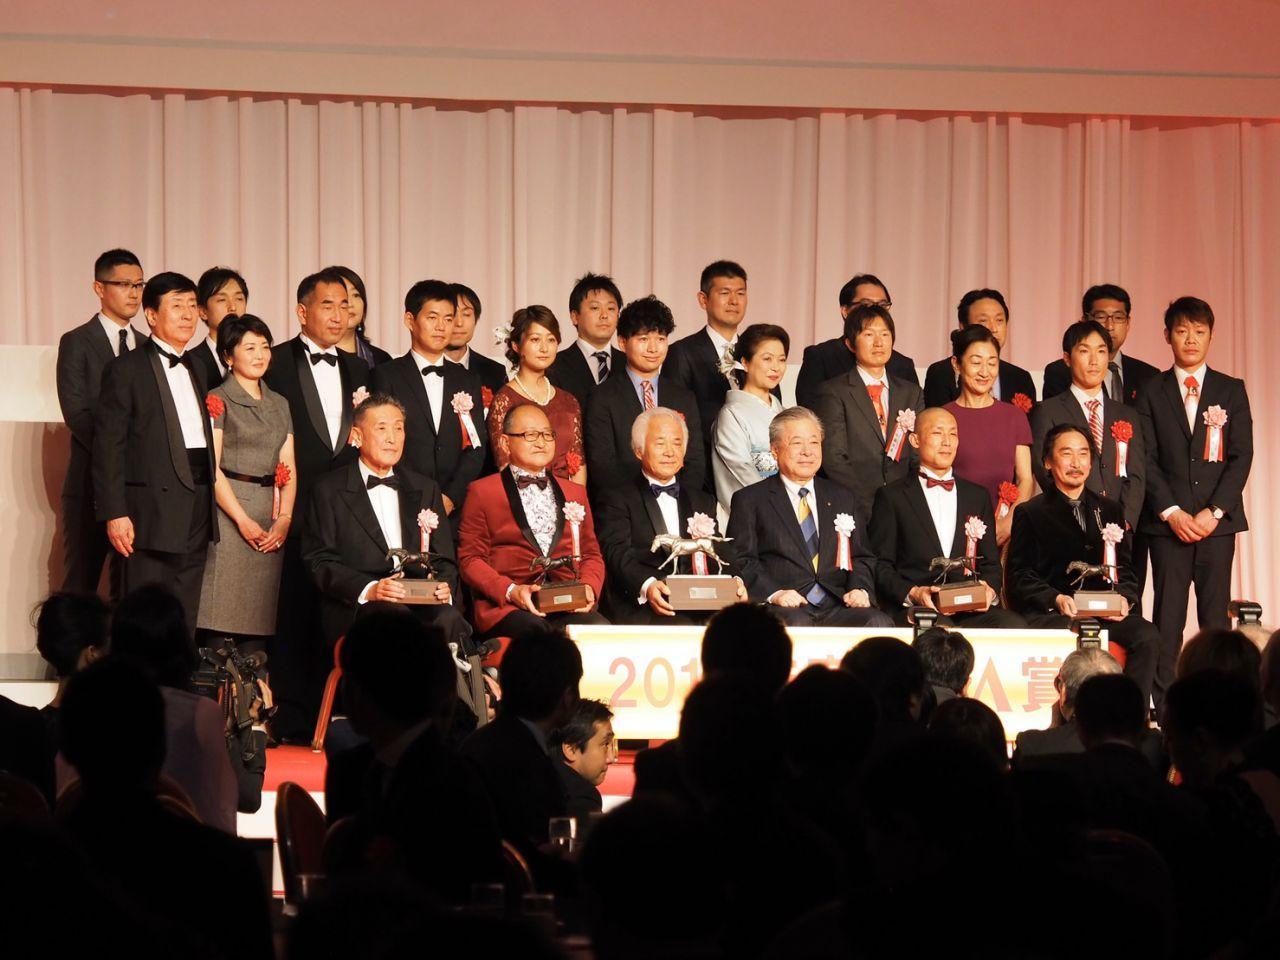 【JRA賞】矢作師「馬っていうのは常識で計ってはいけない」リスグラシューが年度代表馬を受賞